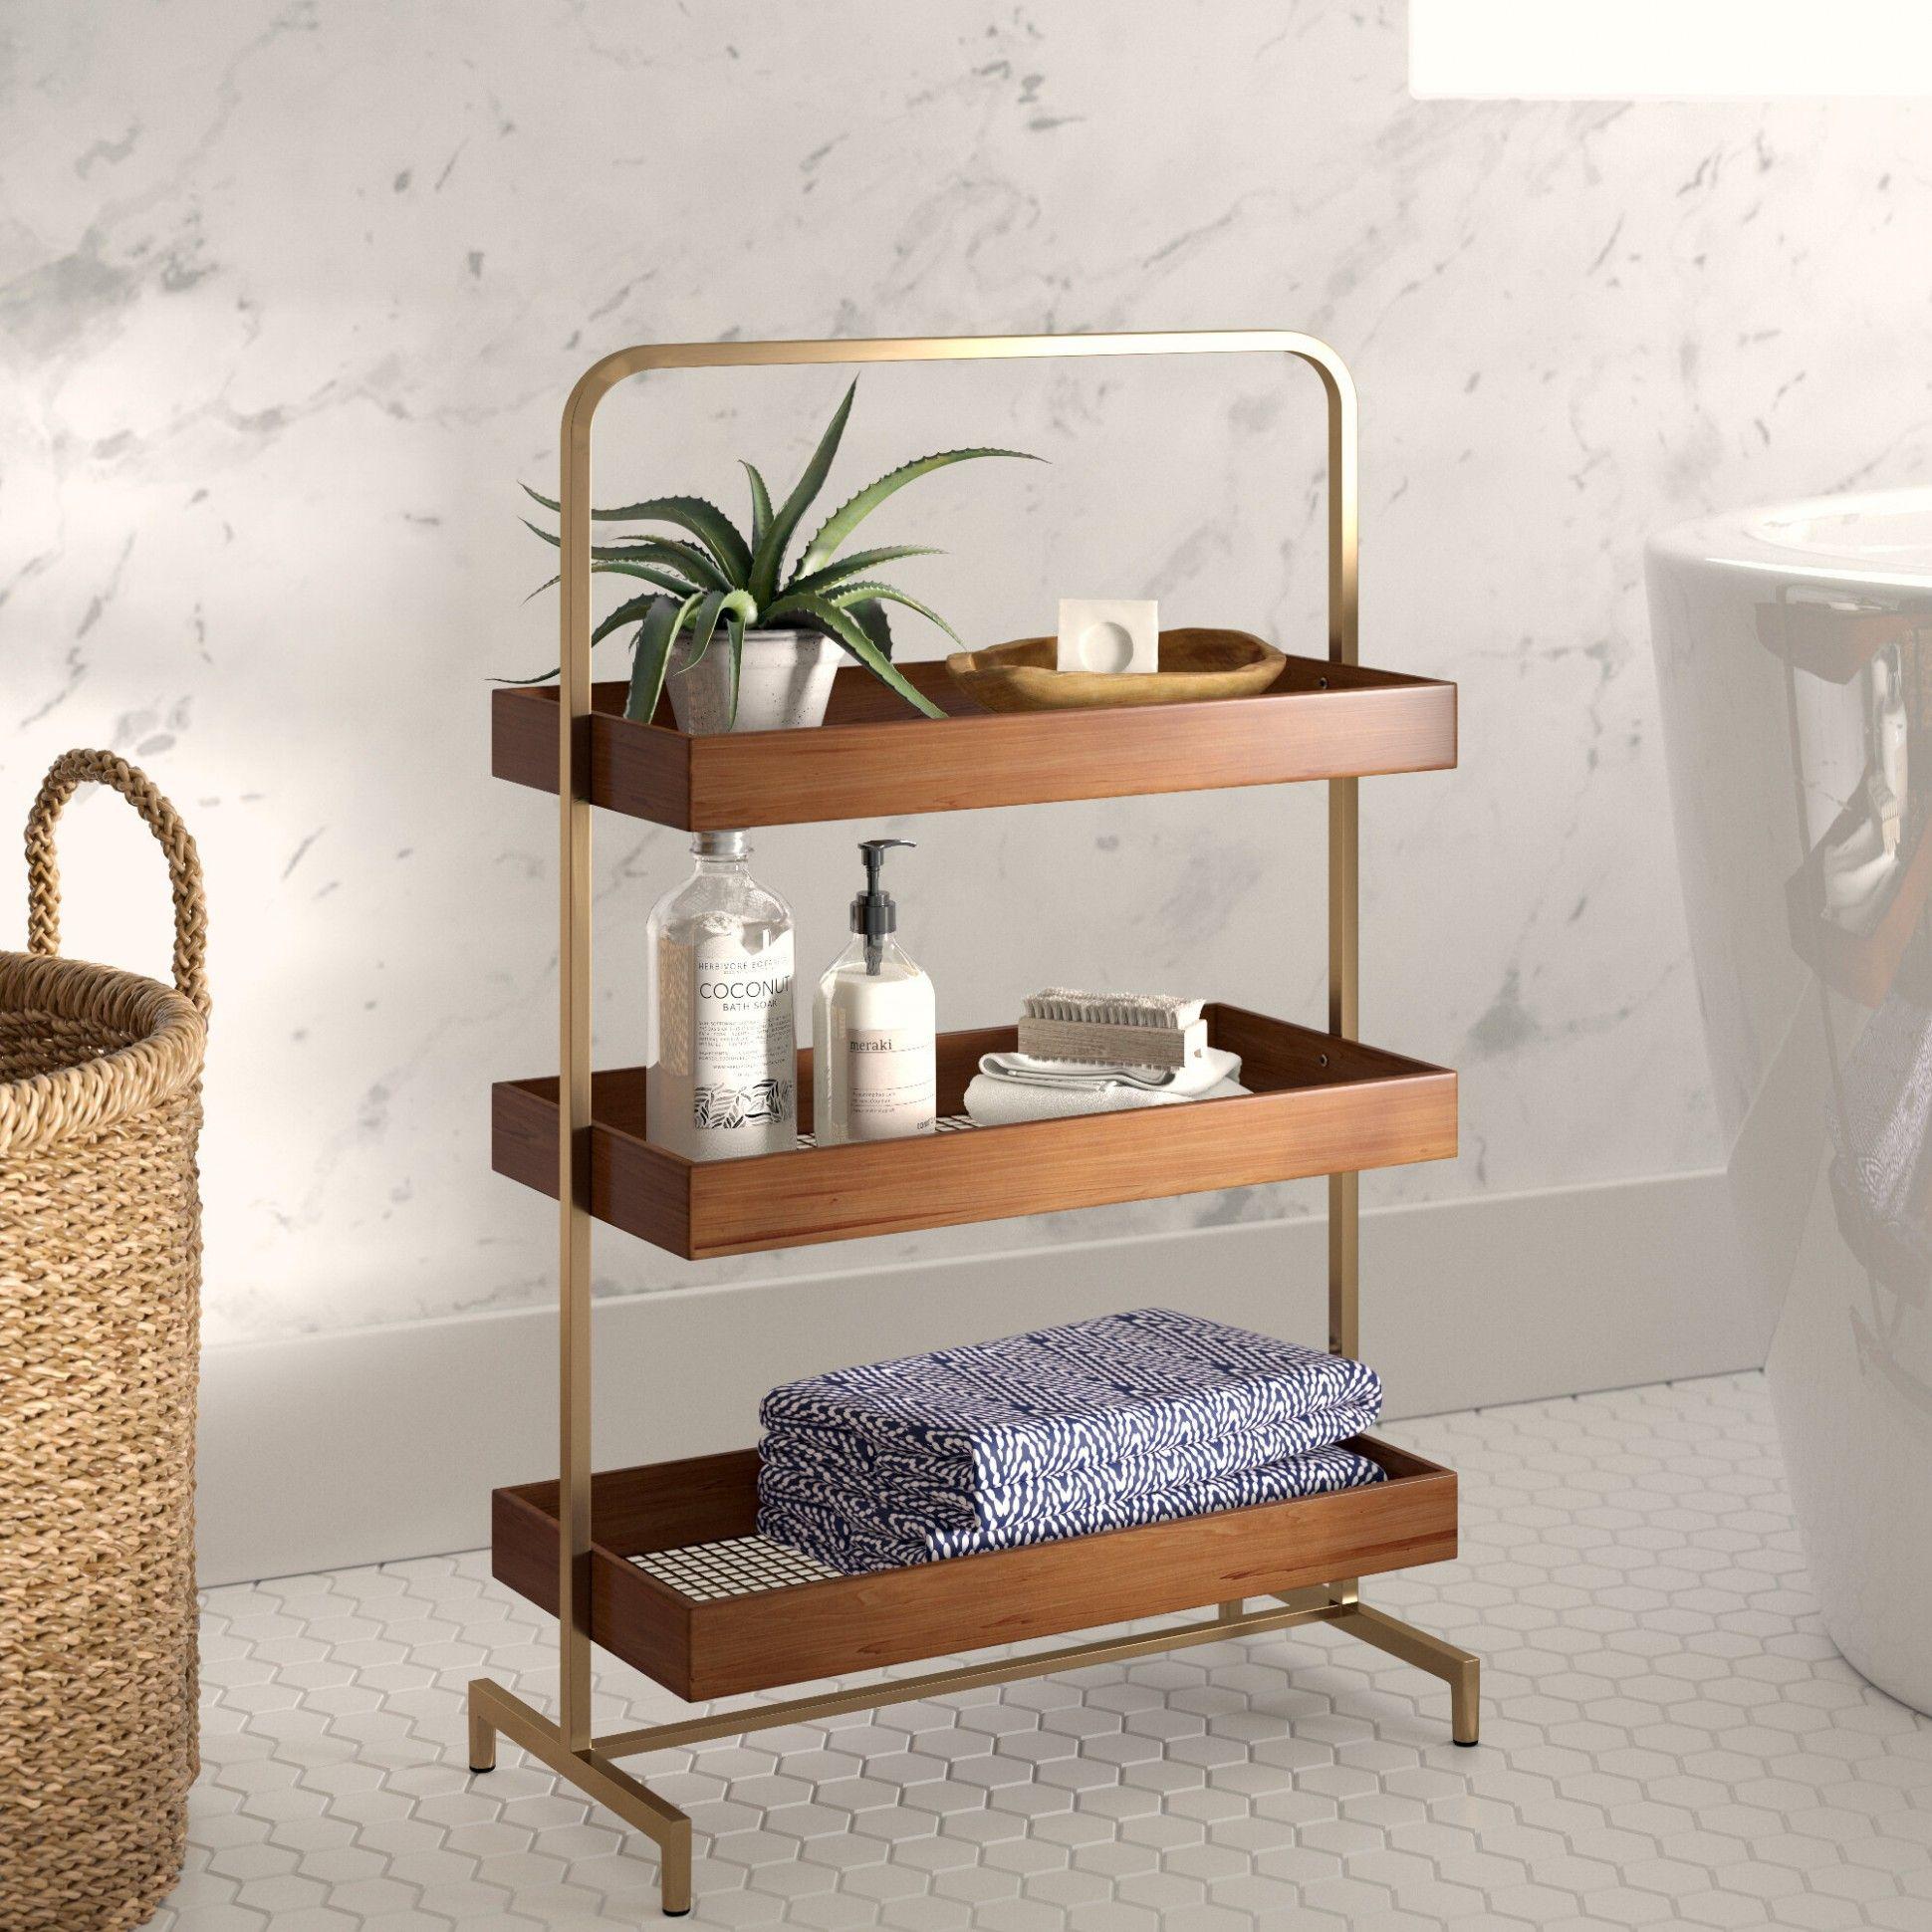 Bathroom Shelves Wayfair in 10  Shelves, Decor, Zen bathroom